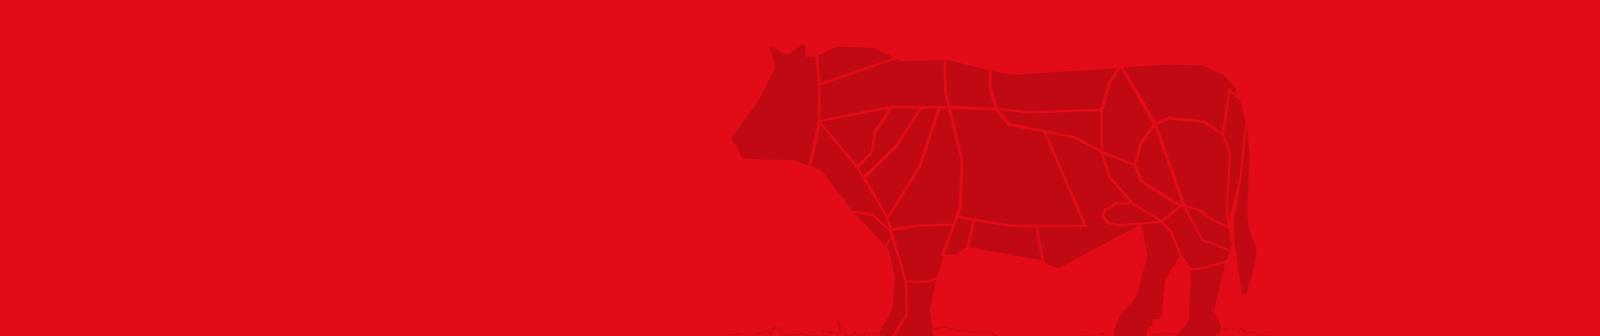 bovino-tagli-carne_baronecarni